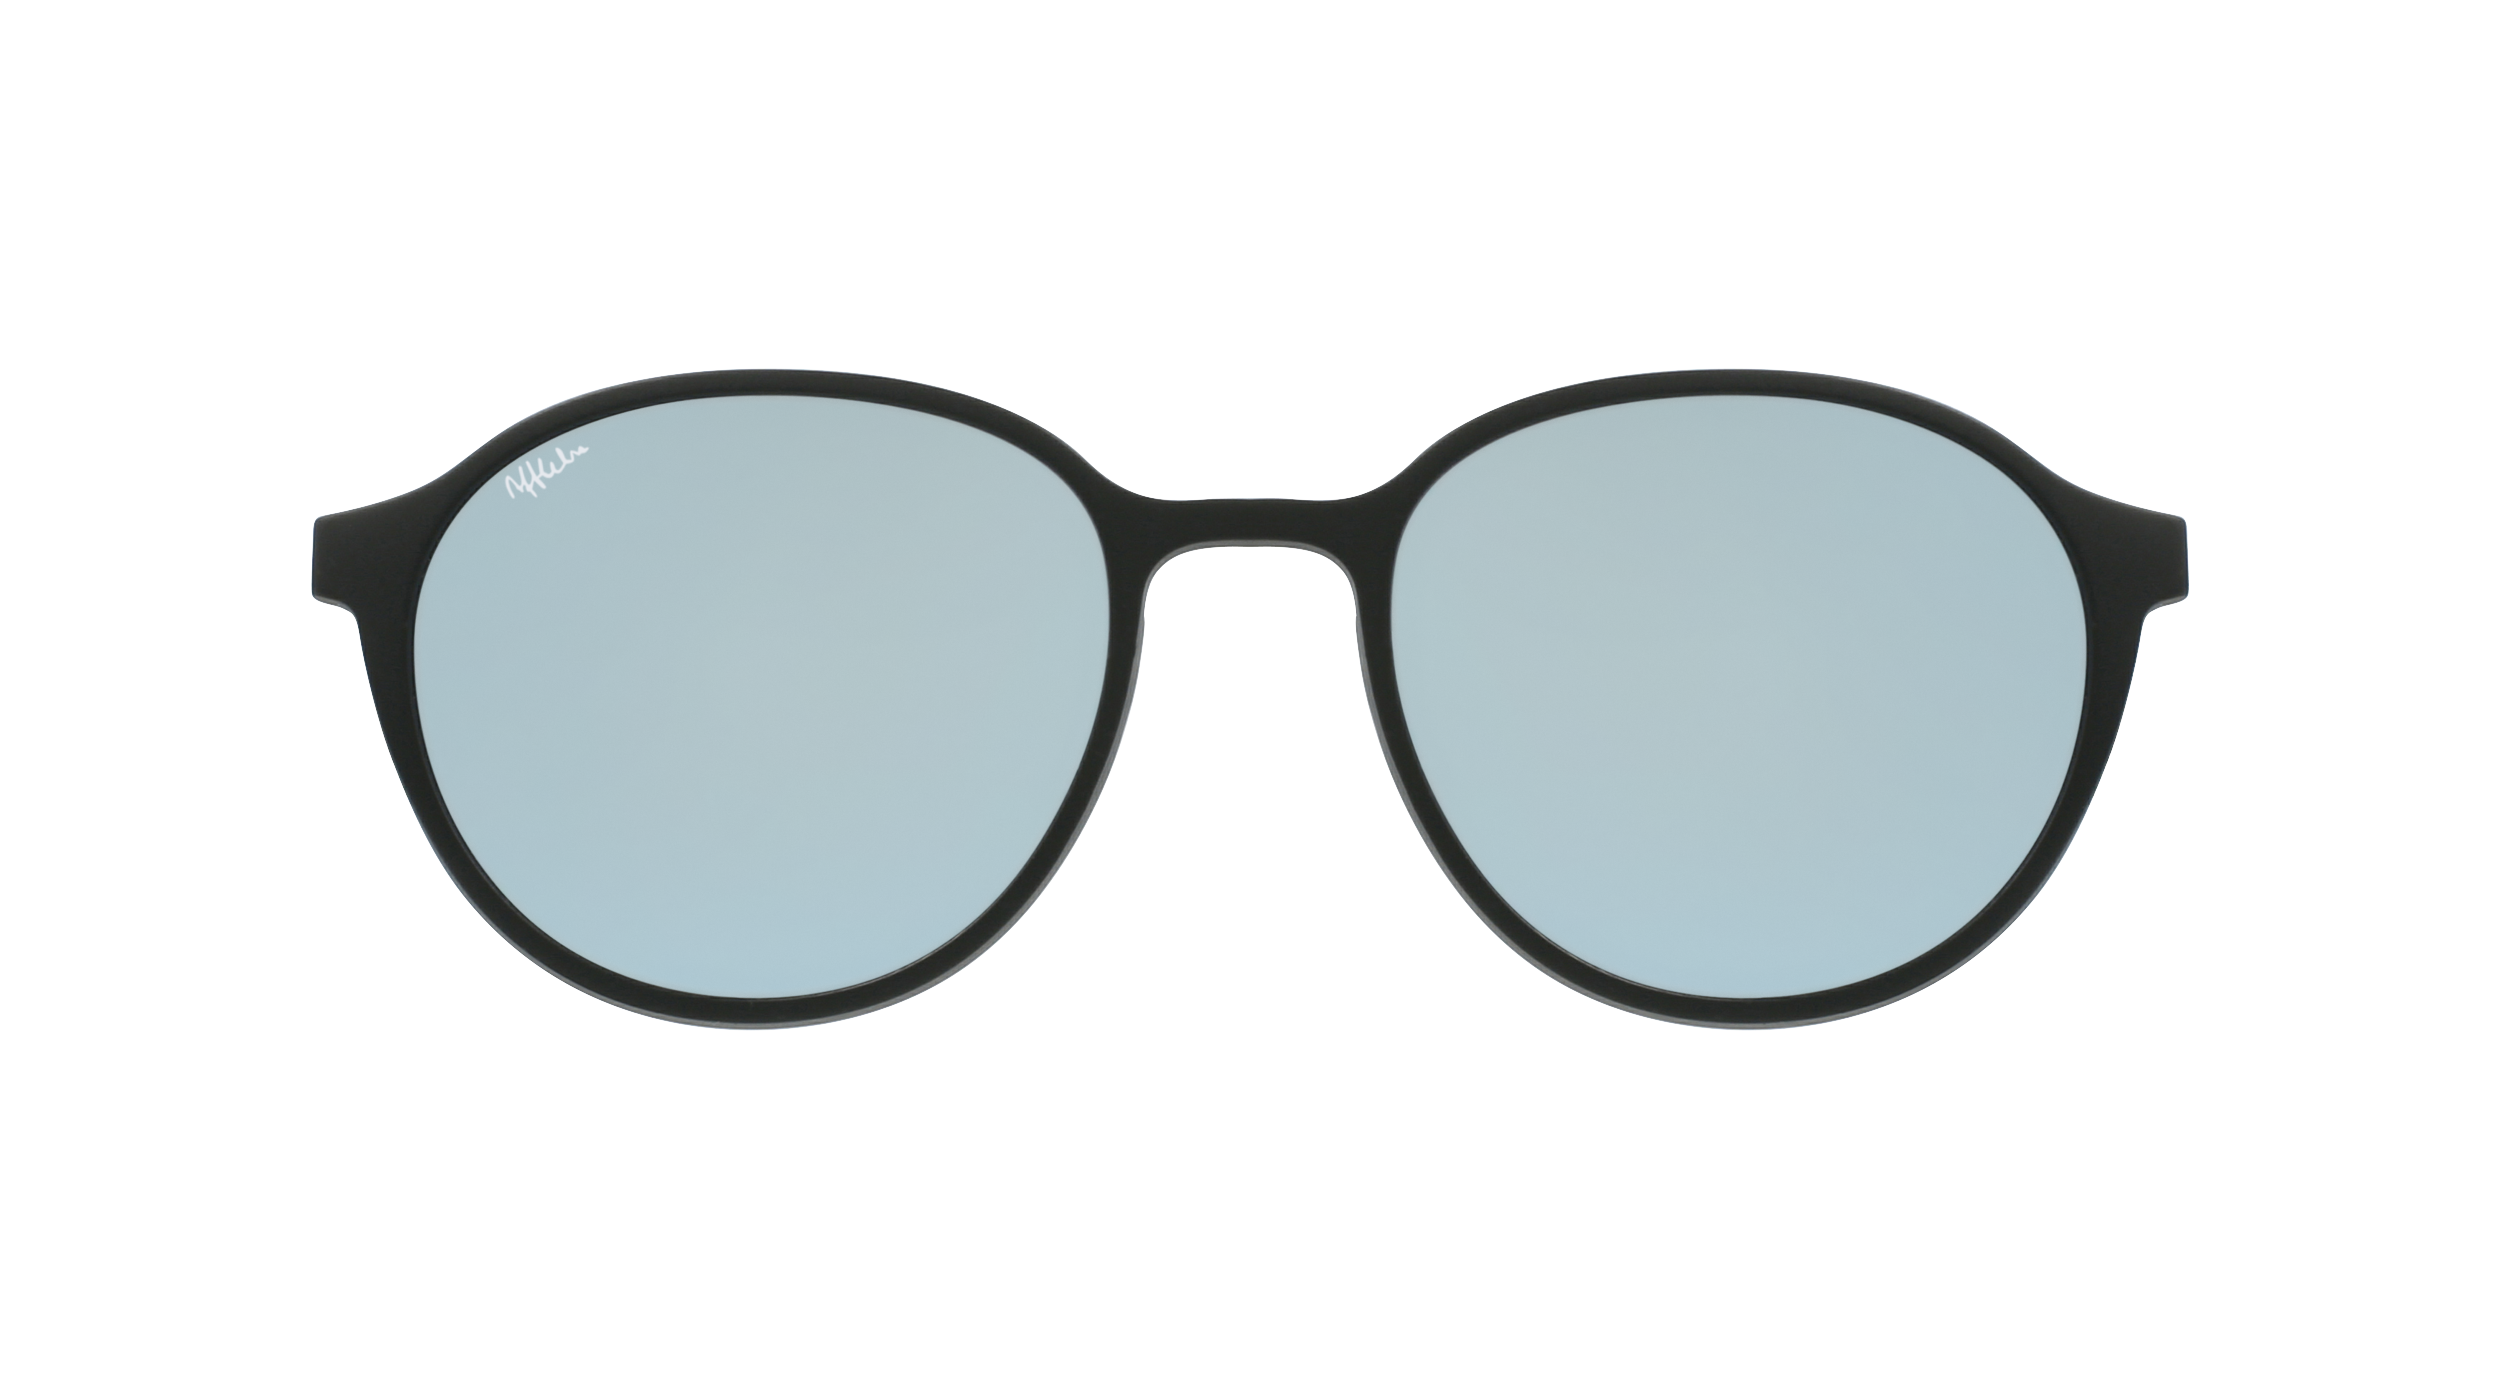 afflelou/france/products/smart_clip/clips_glasses/07630036458754.png